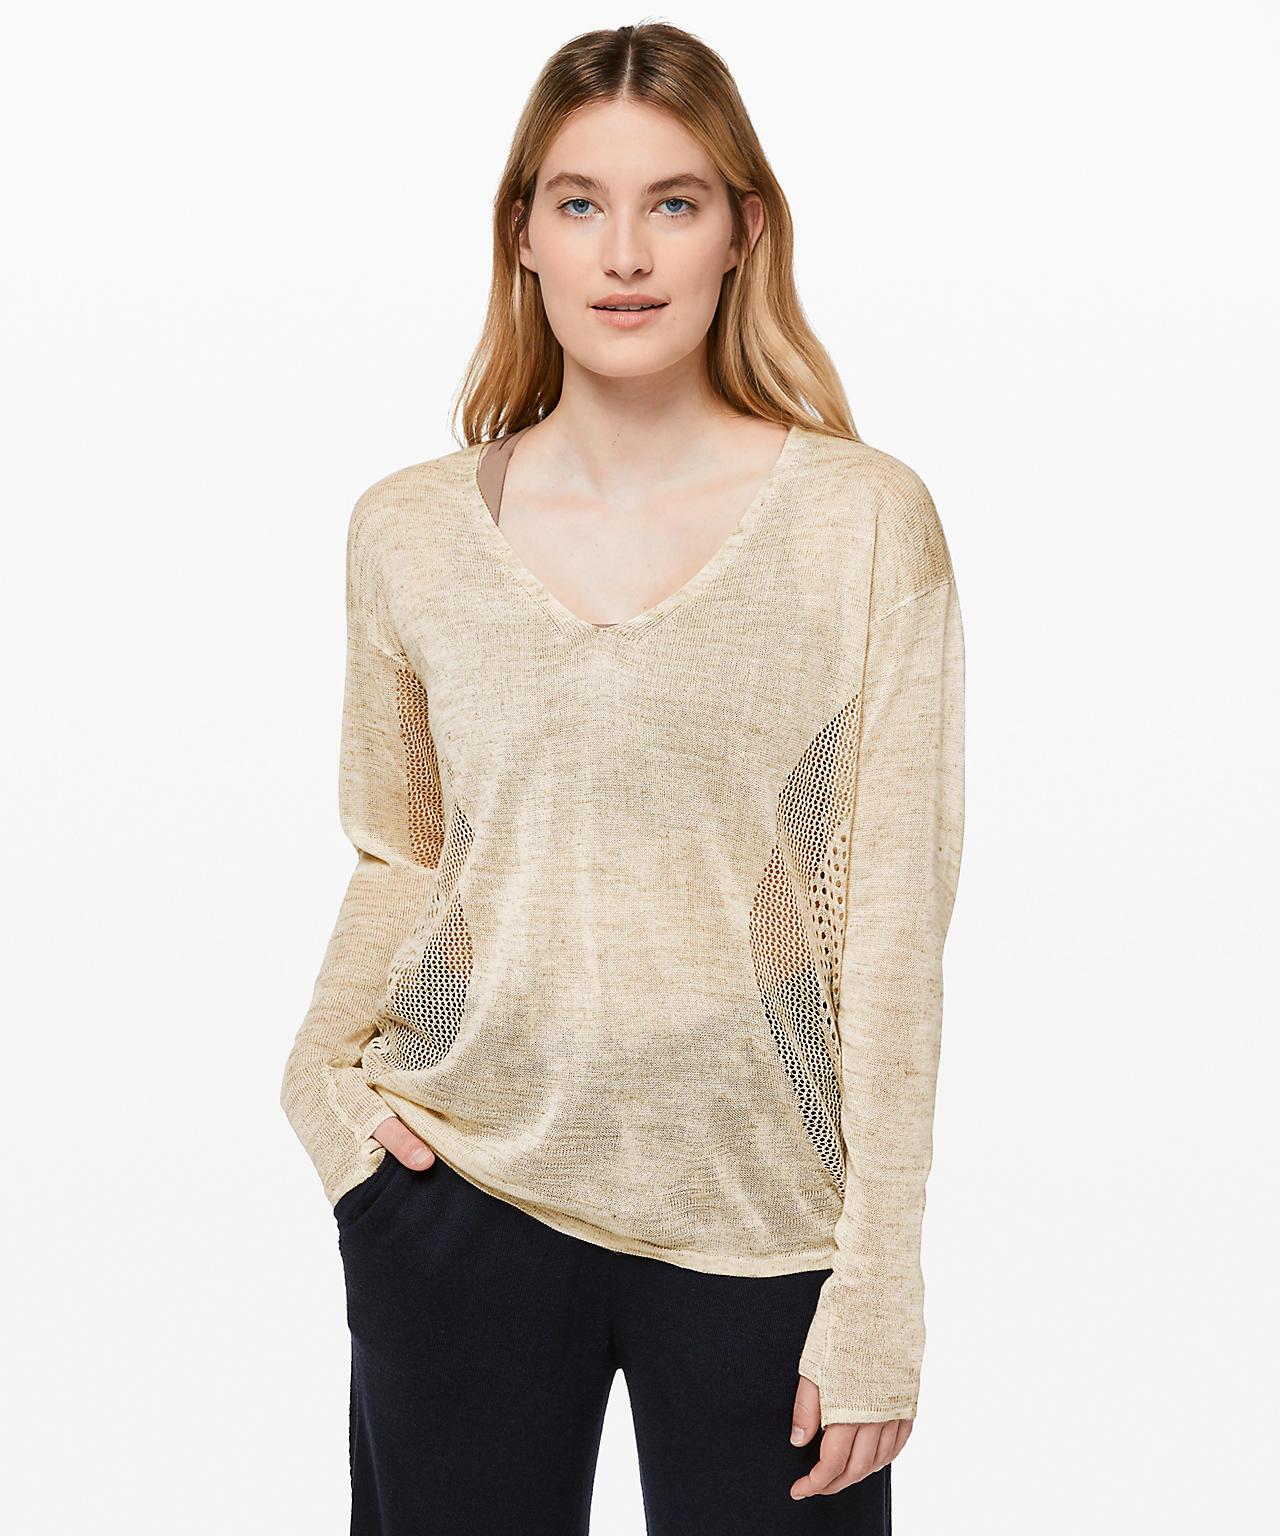 Still Movement Sweater, Lululemon